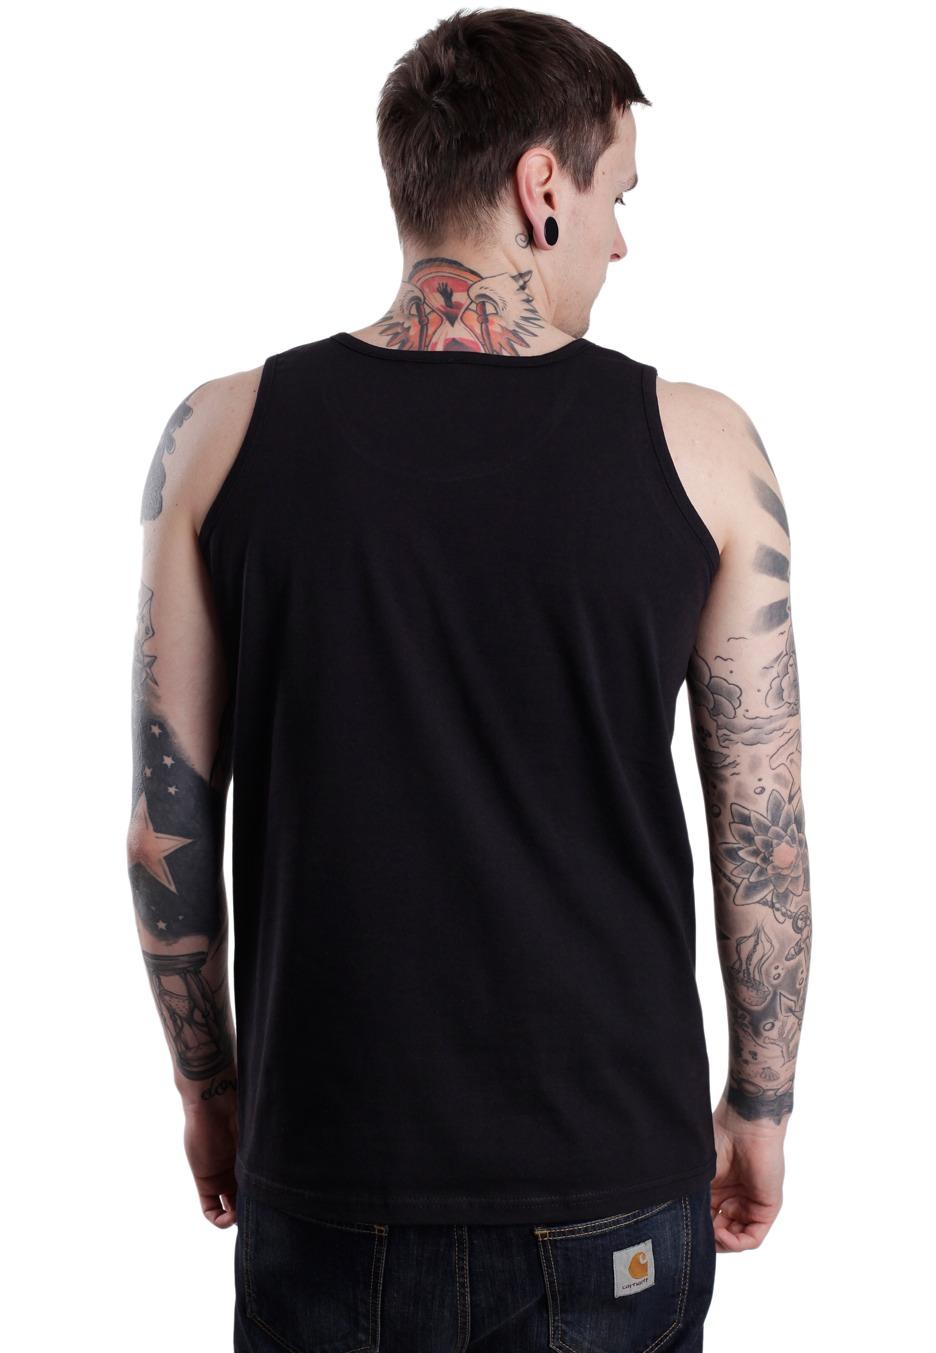 chelsea grin my damnation tank official metalcore merchandise shop uk. Black Bedroom Furniture Sets. Home Design Ideas